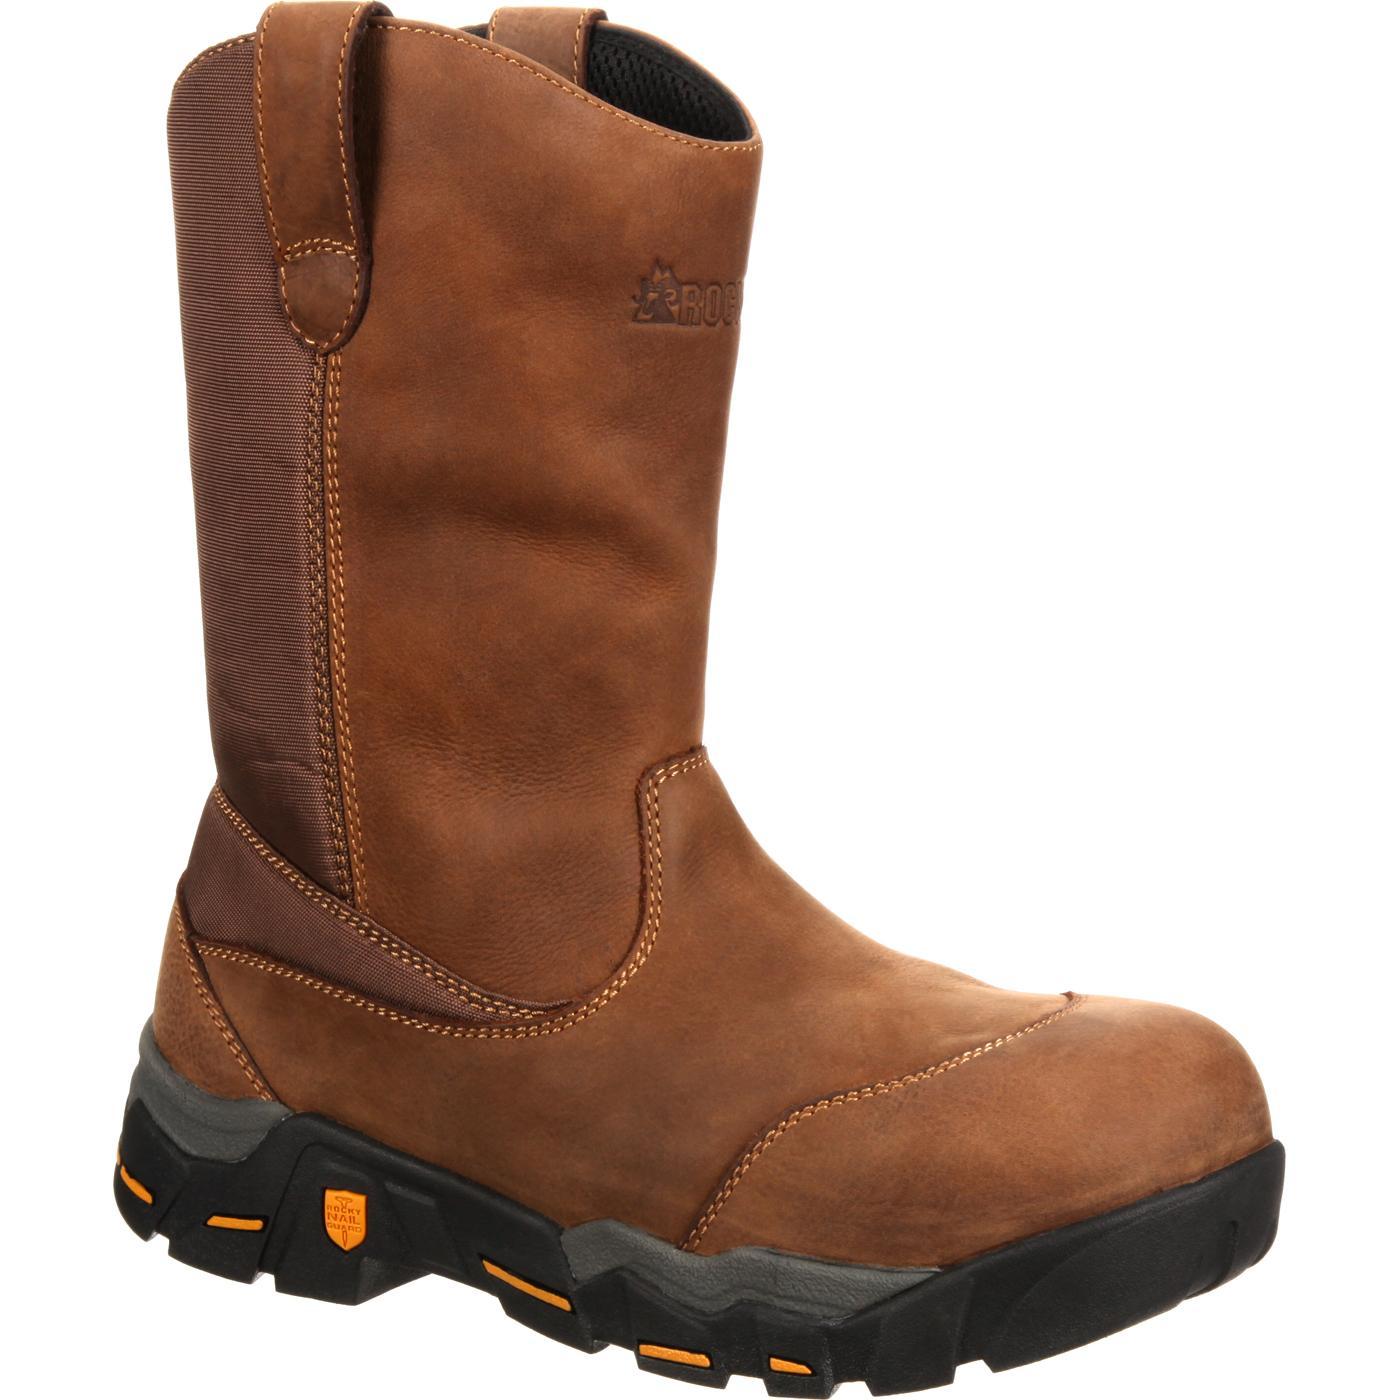 2017 Buy Rocky Mobilite 11 Western MediumWide Waterproof Boot Brown Leather